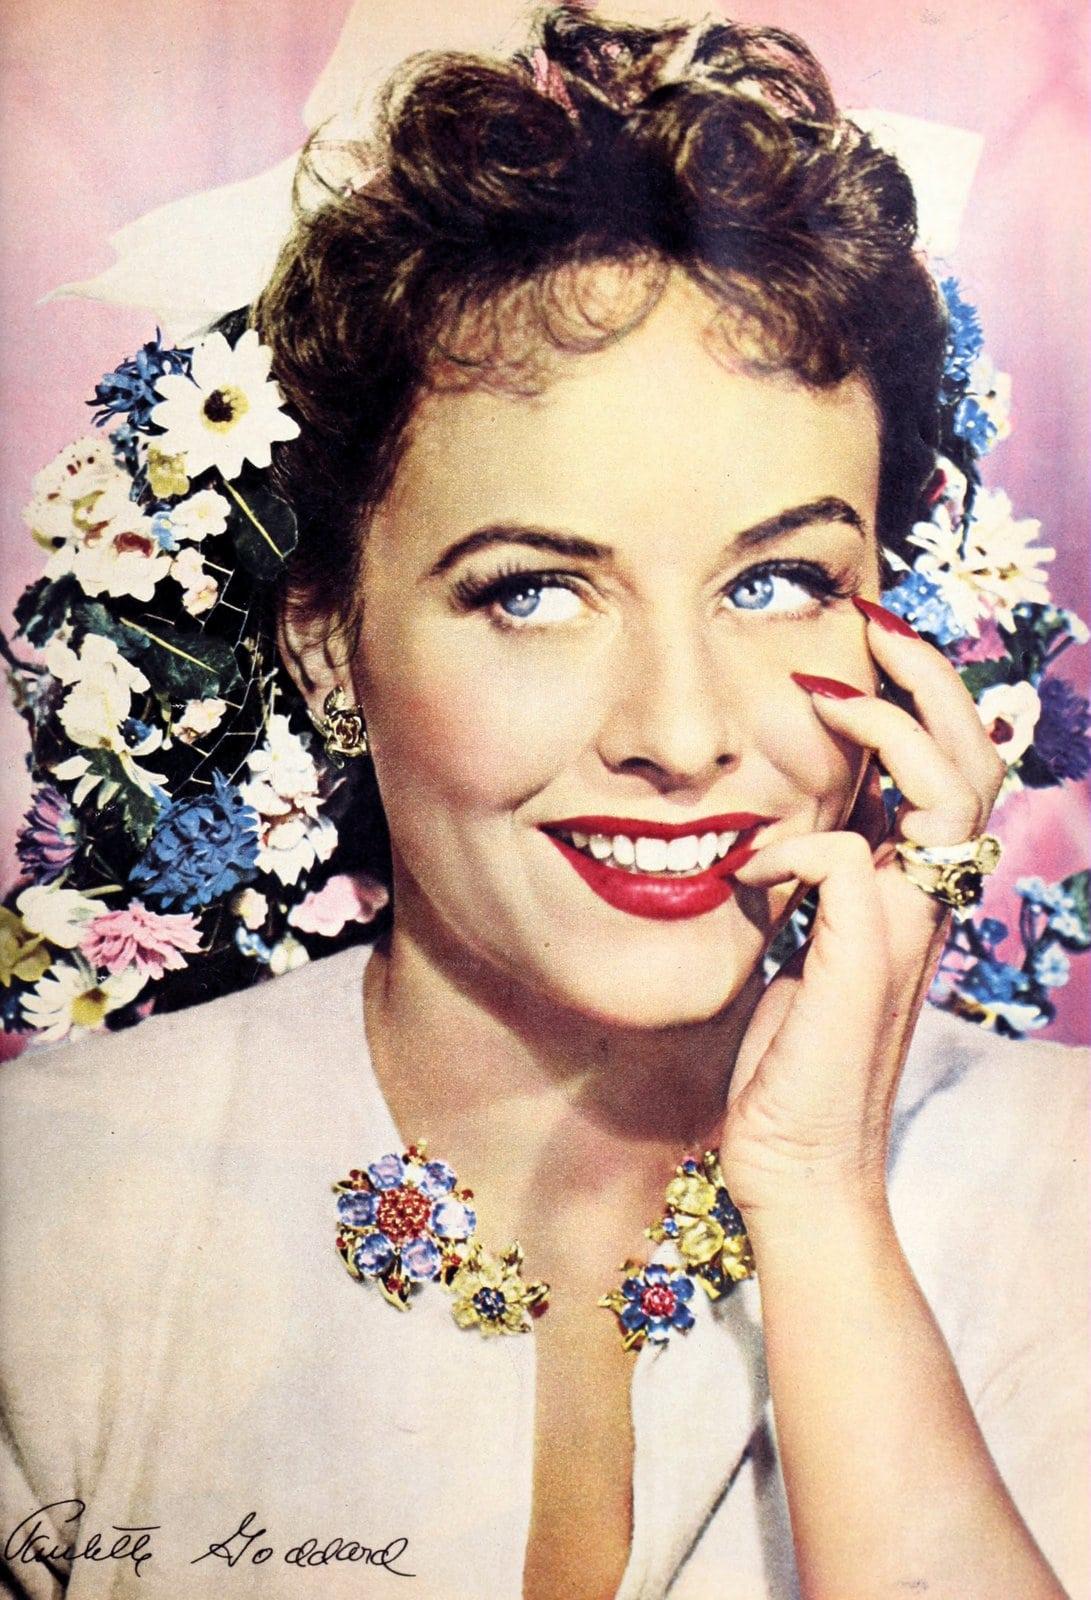 Vintage 1940s actress Paulette Goddard wearing red lipstick